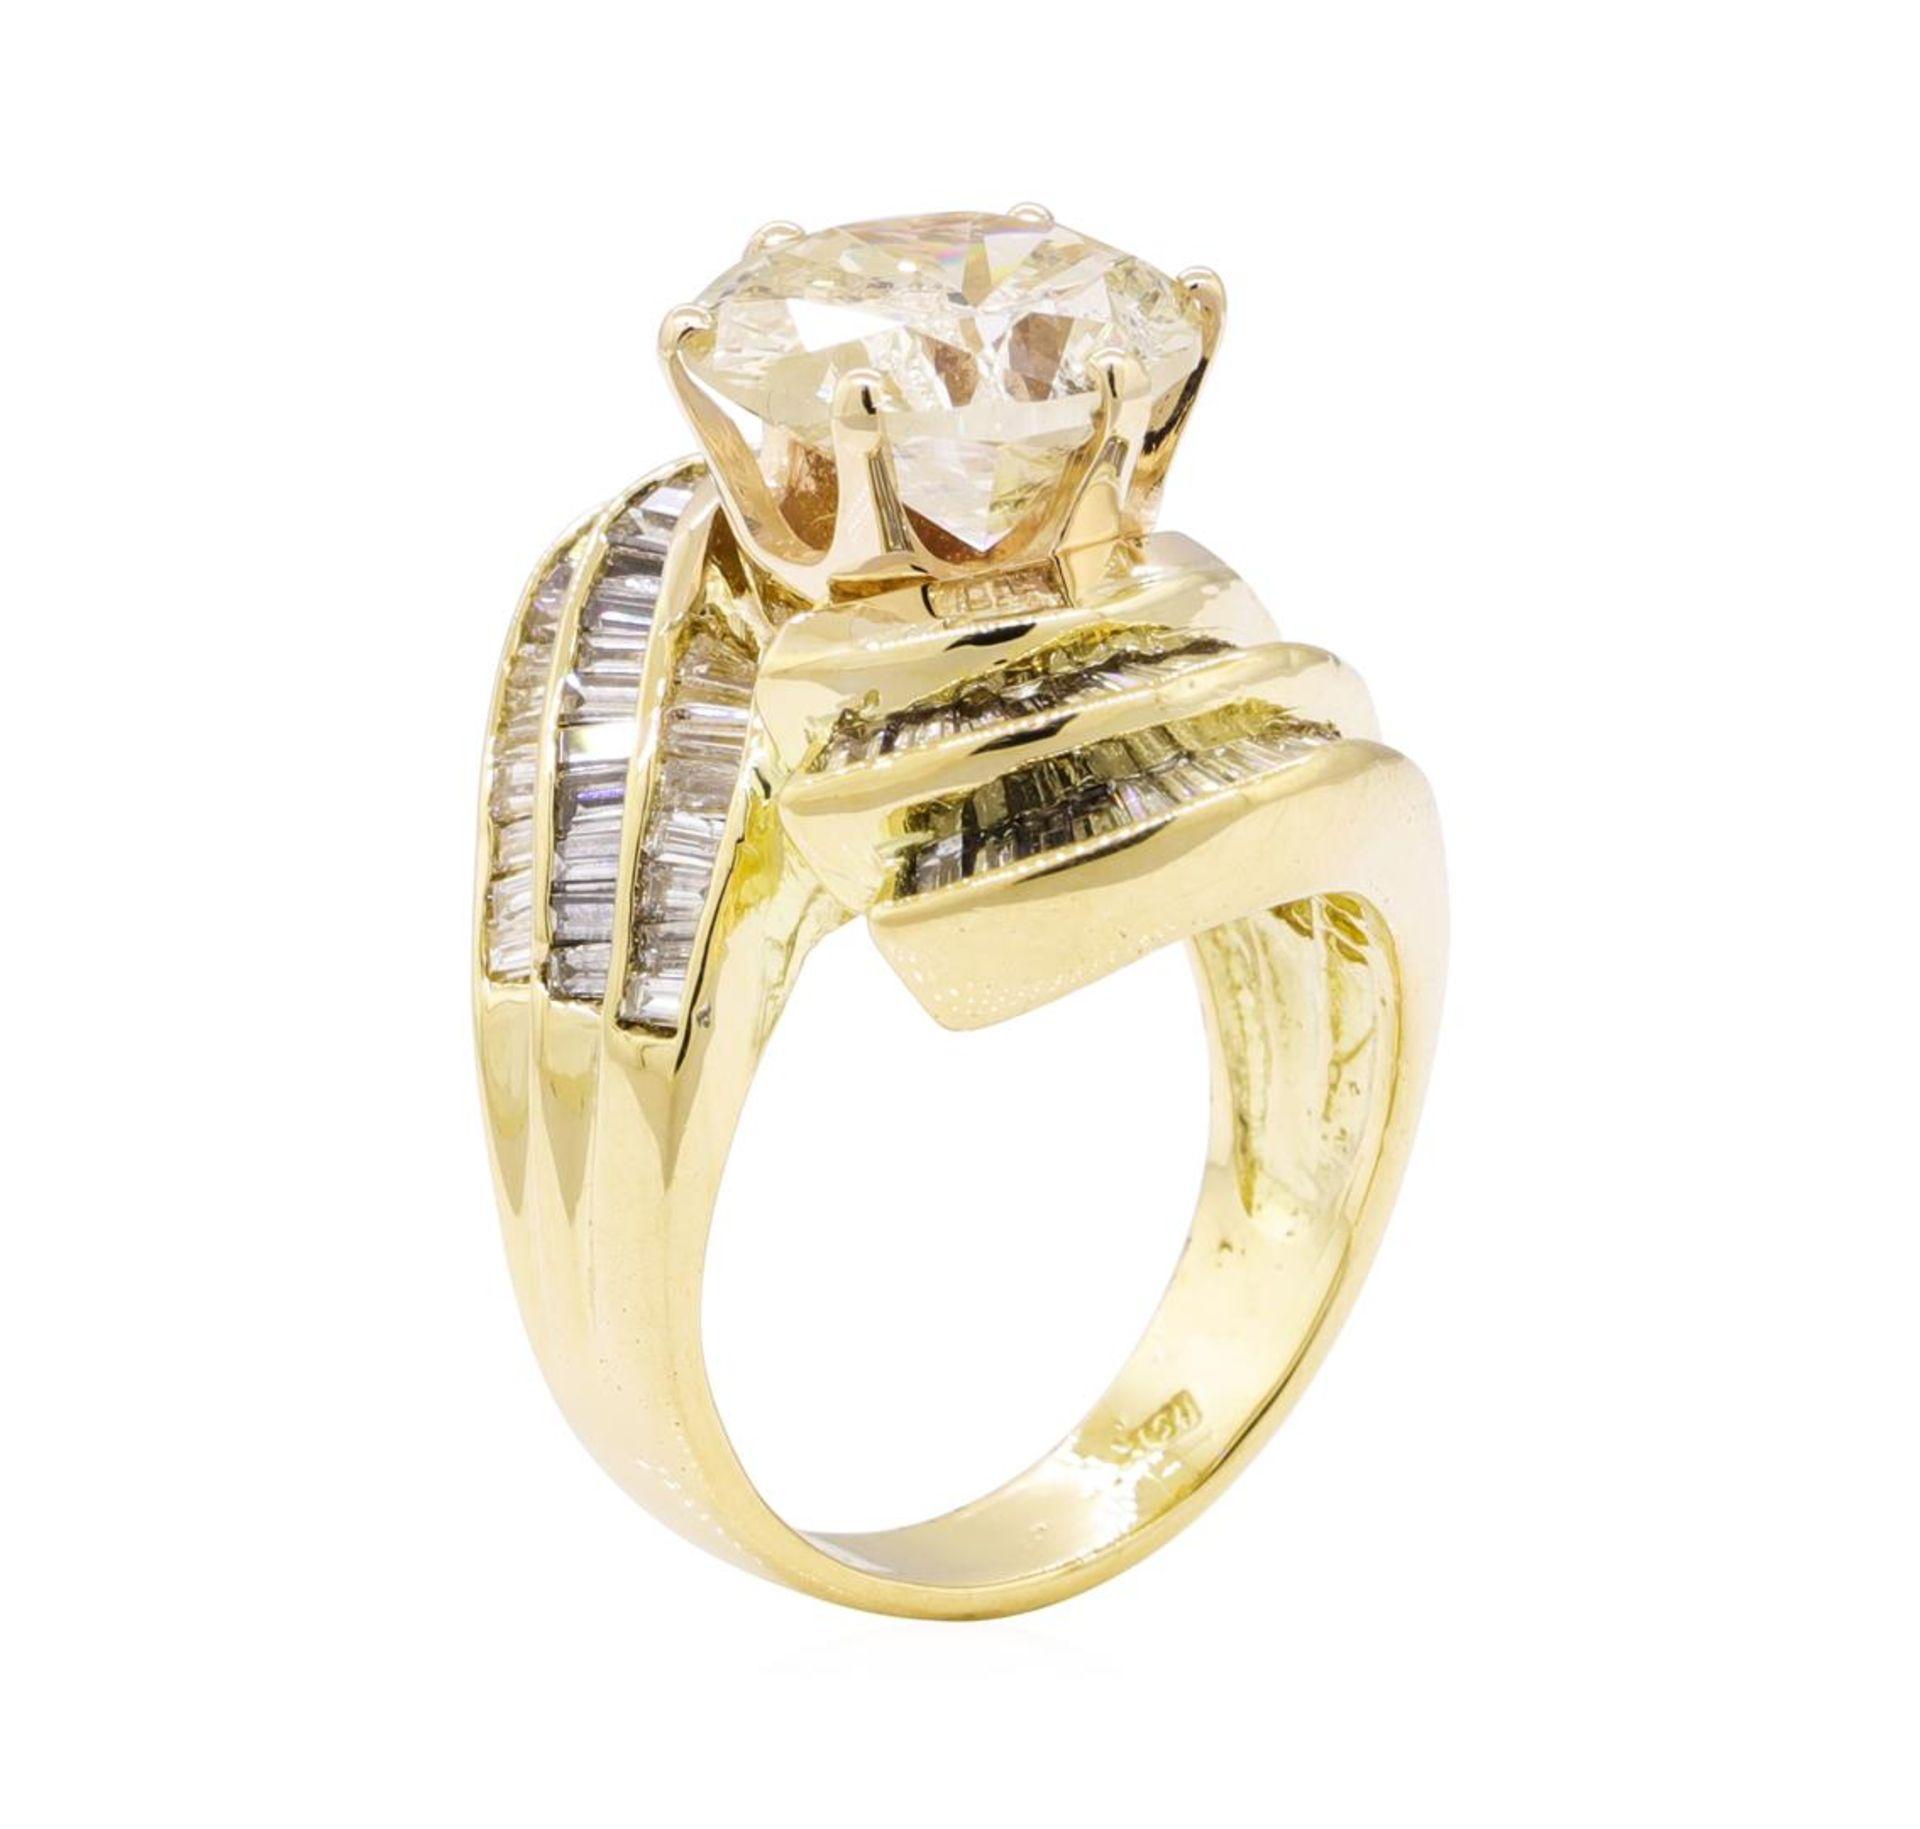 7.51 ctw Diamond Ring - 18KT Yellow Gold - Image 4 of 5